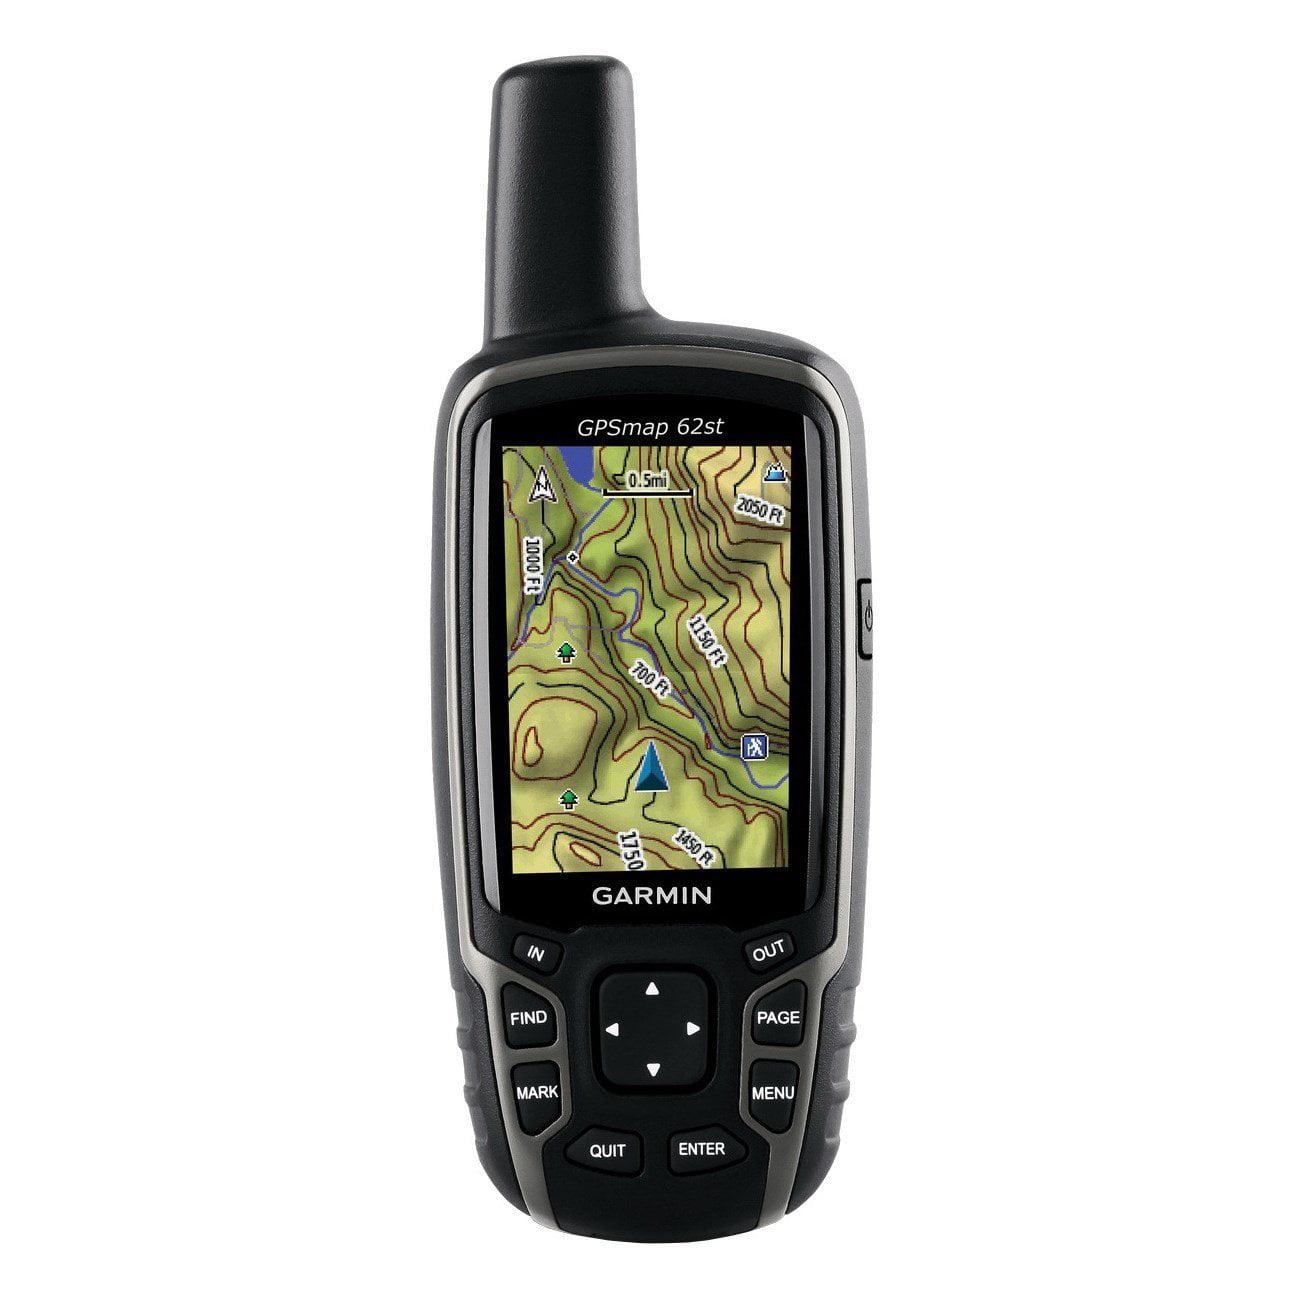 "Garmin Gpsmap 62st Handheld Gps Navigator Portable 2.6"" 65000 Colors Altimeter, Compass, Barometer, Photo Viewer,... by Garmin"